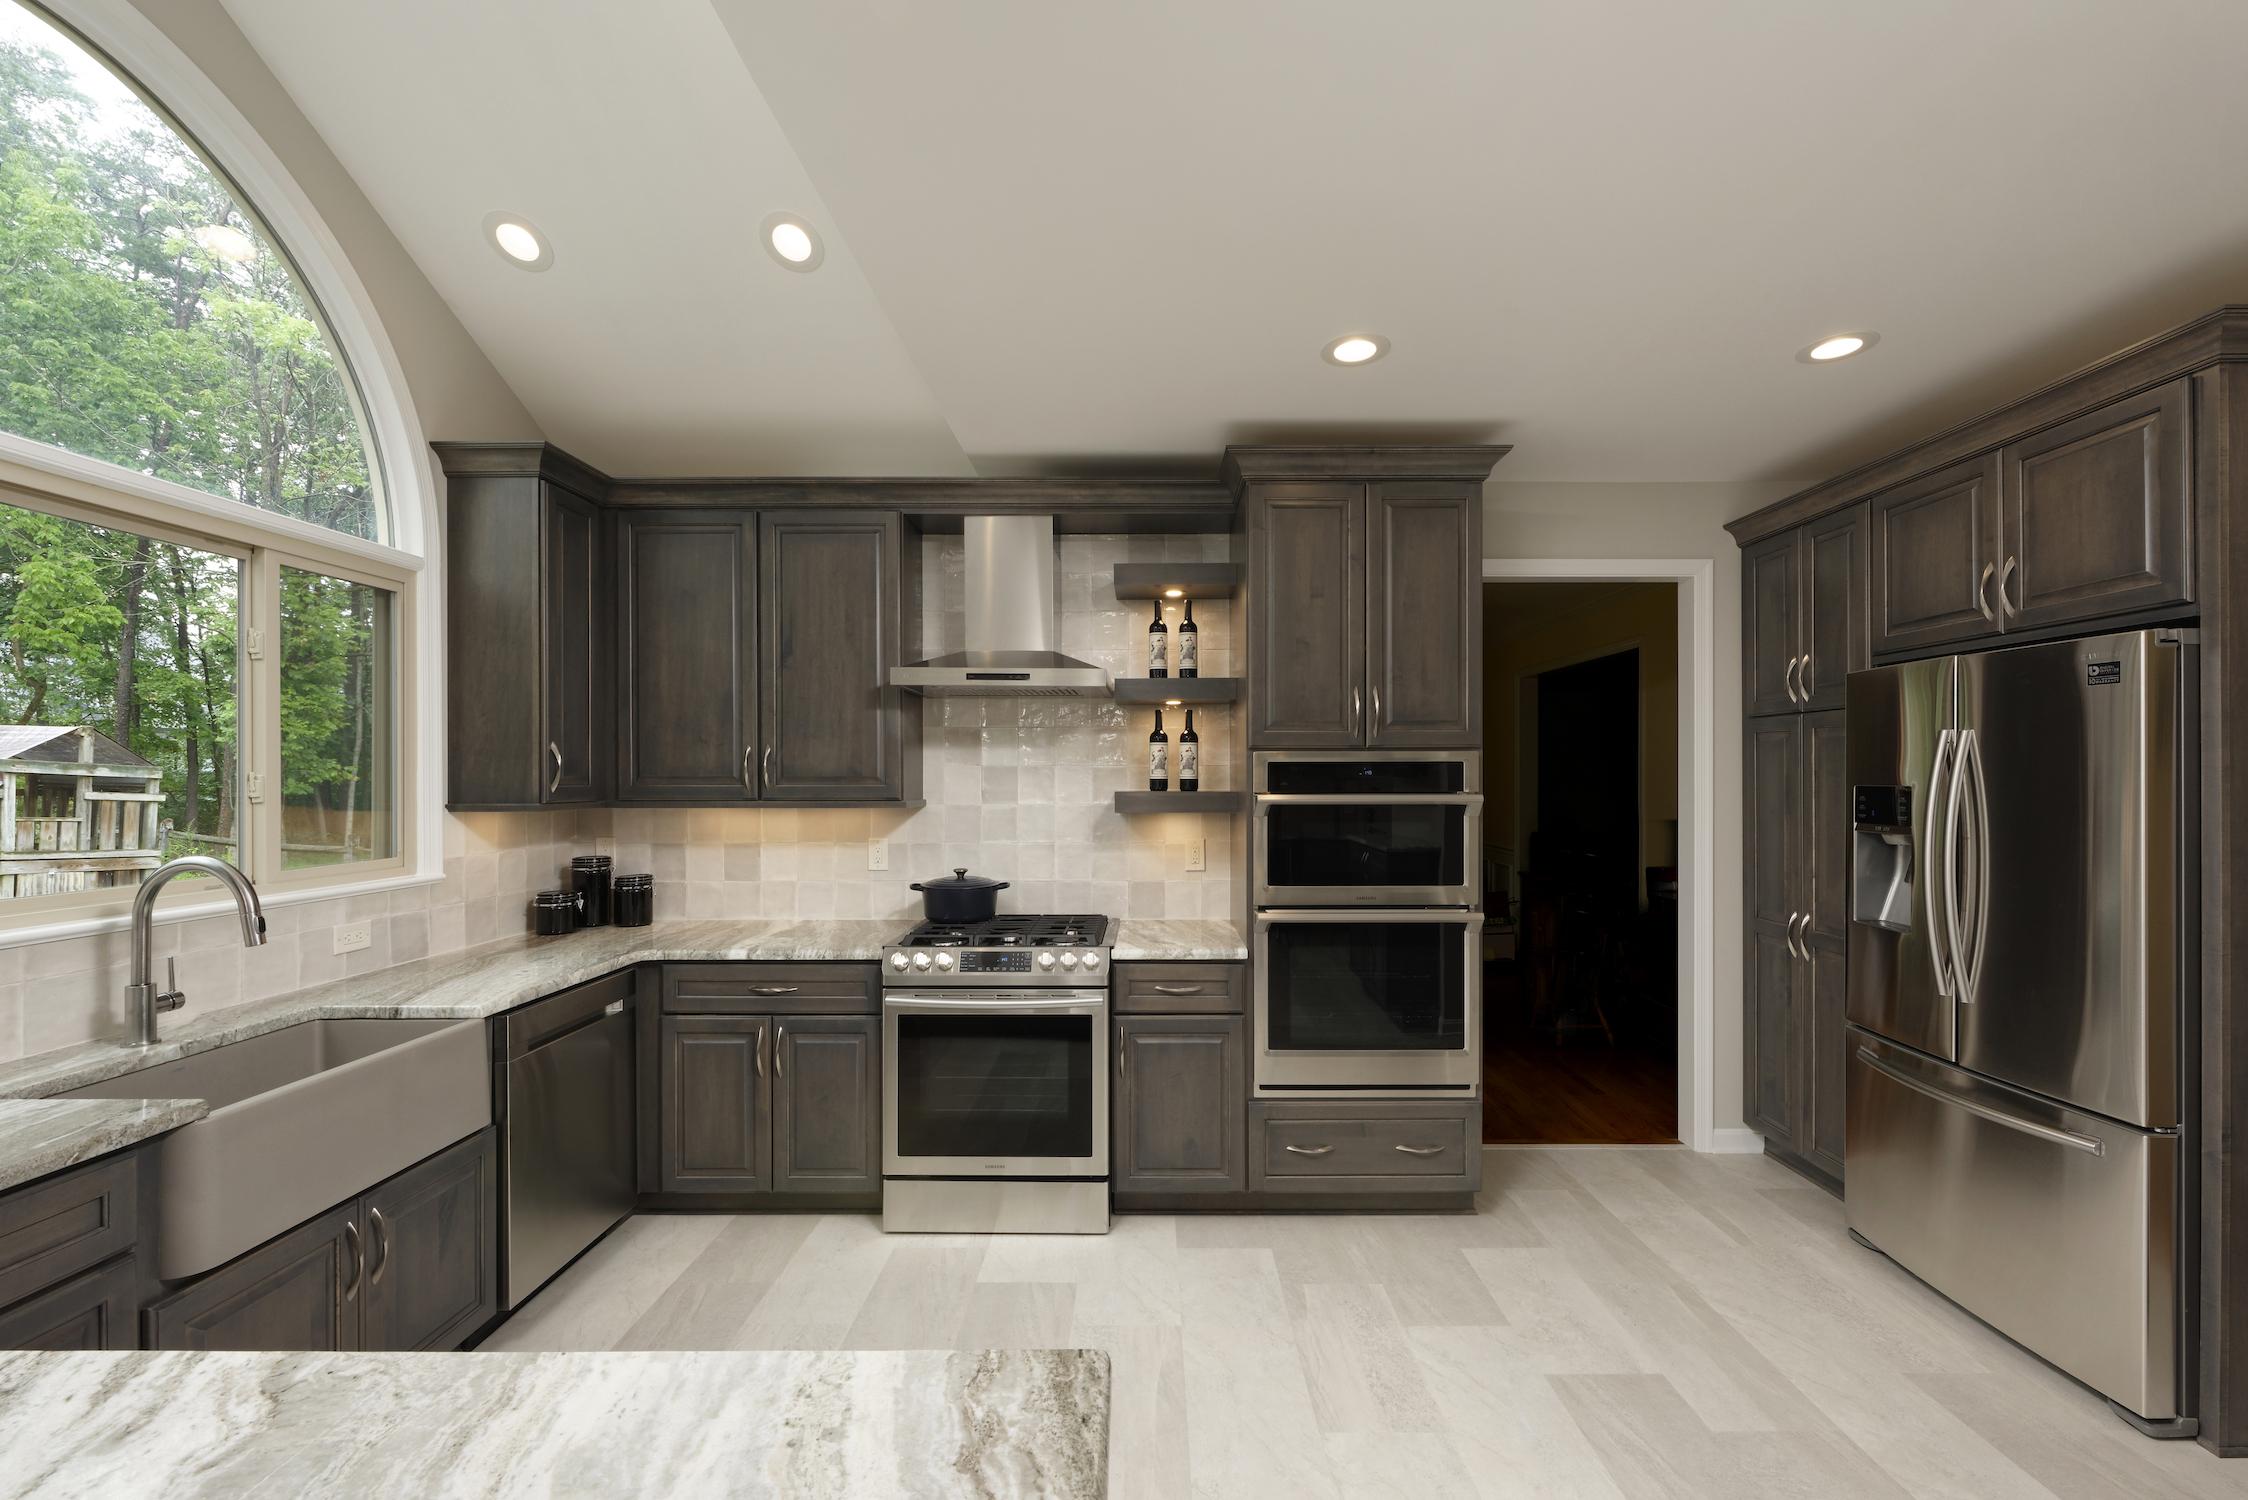 Centreville Virginia Kitchen Remodel